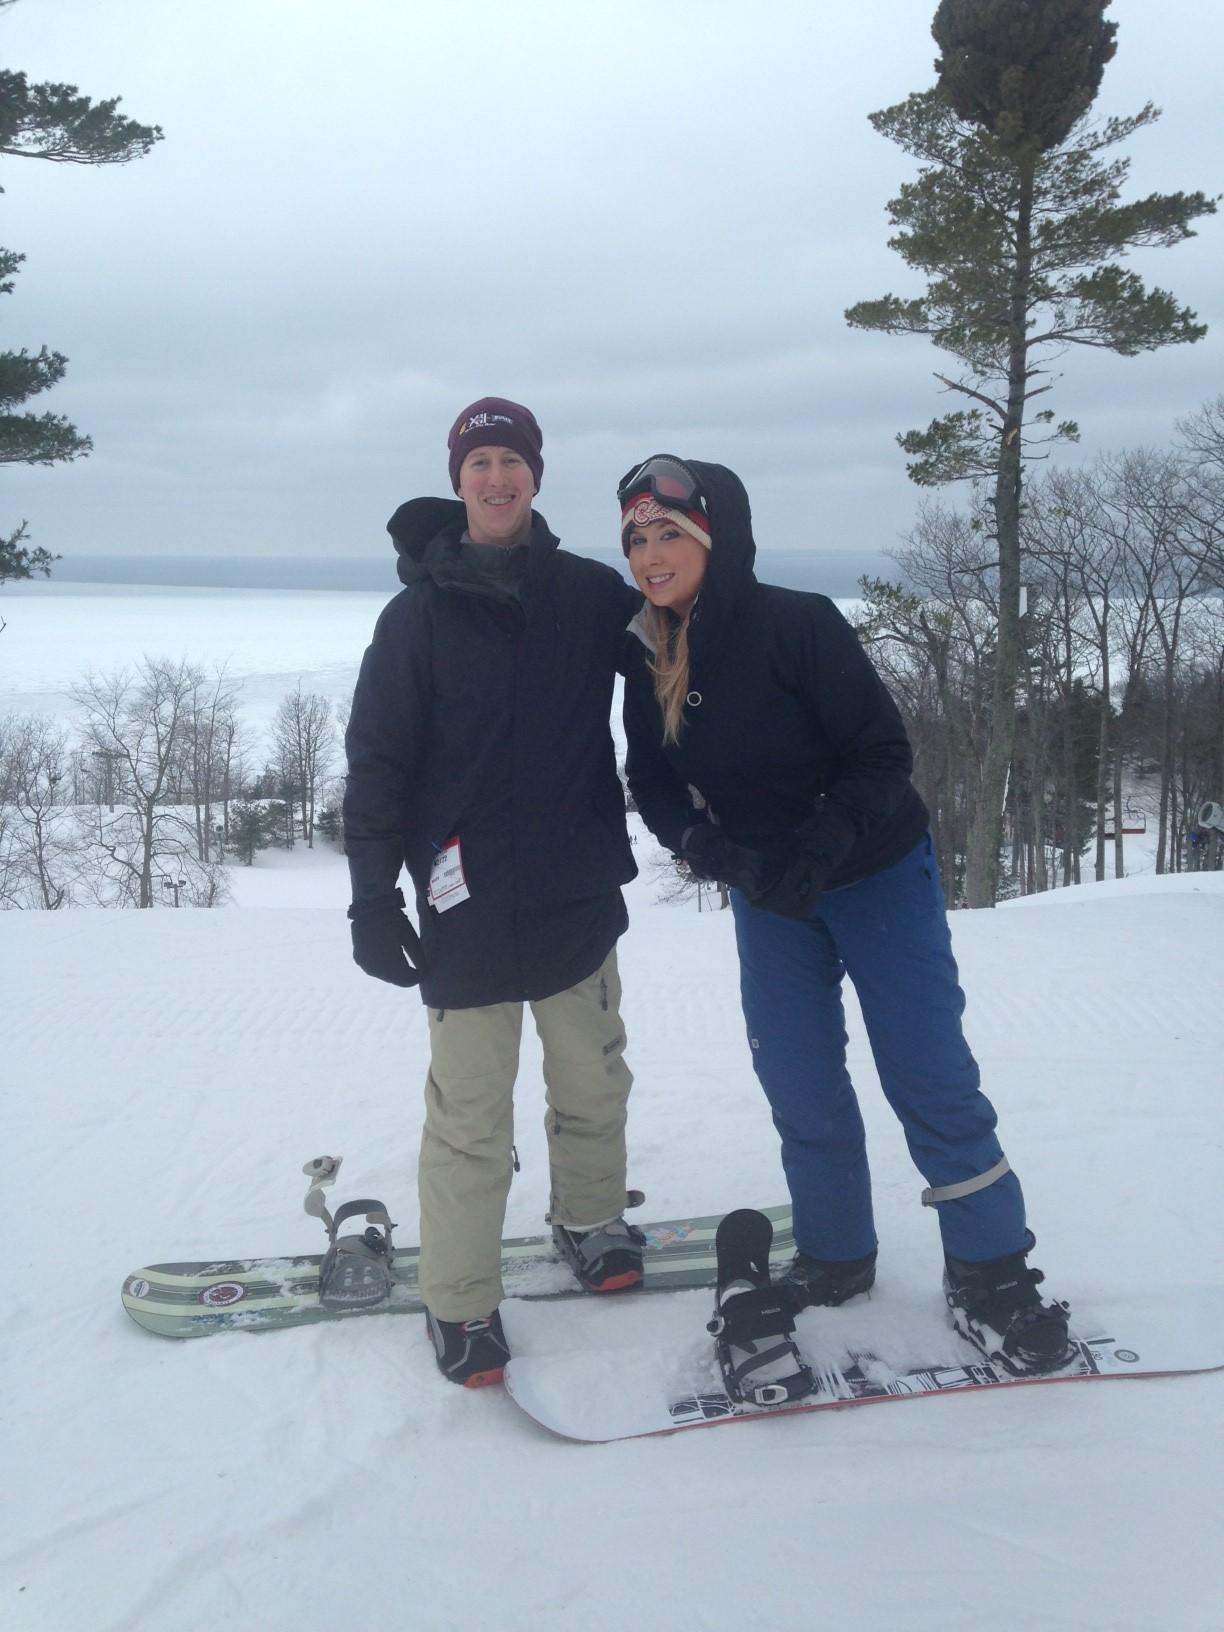 Matt Barnum Snowboard